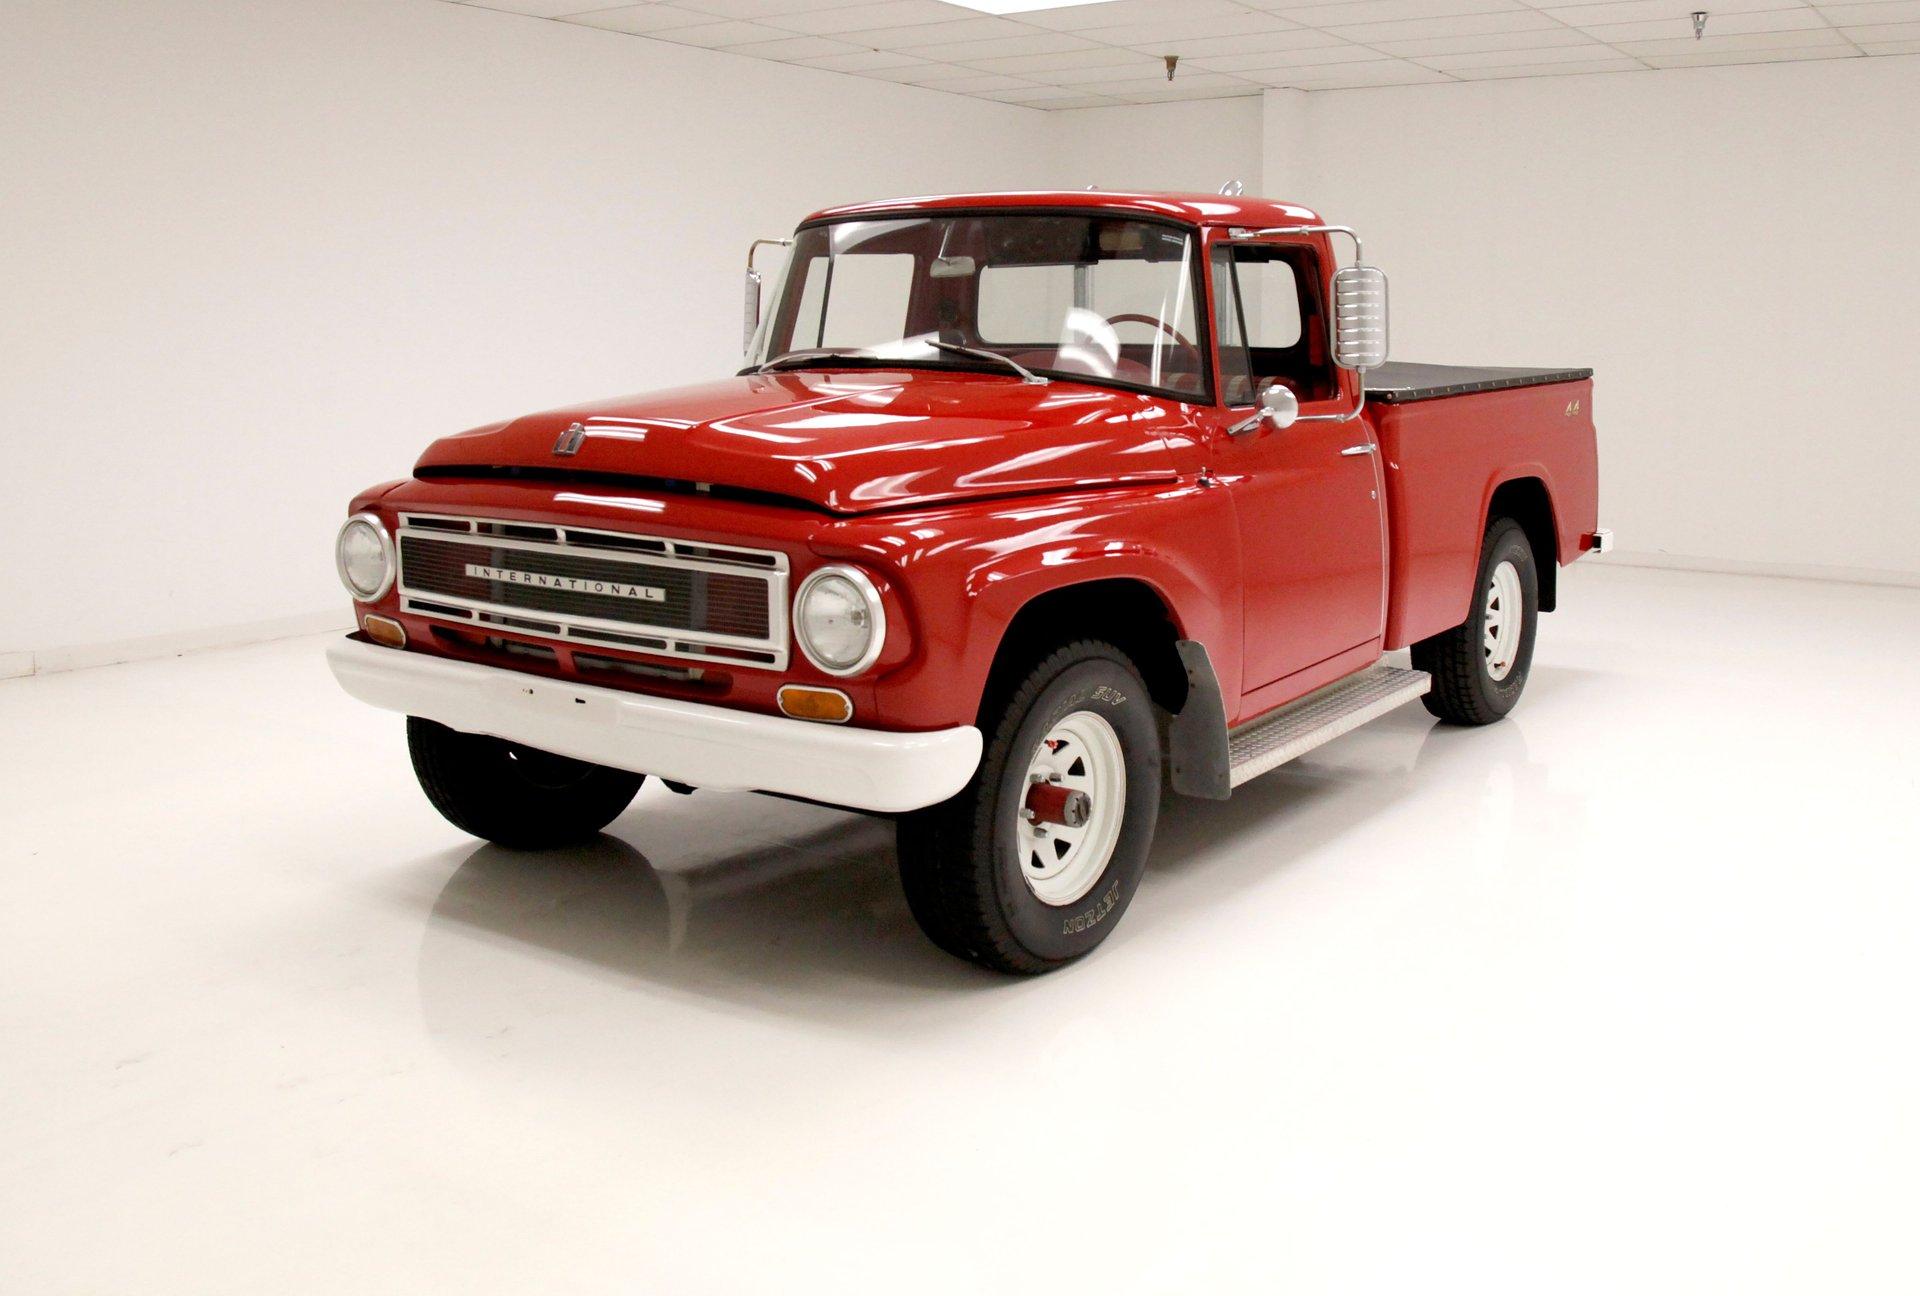 1967 International Harvester 1100B Pickup